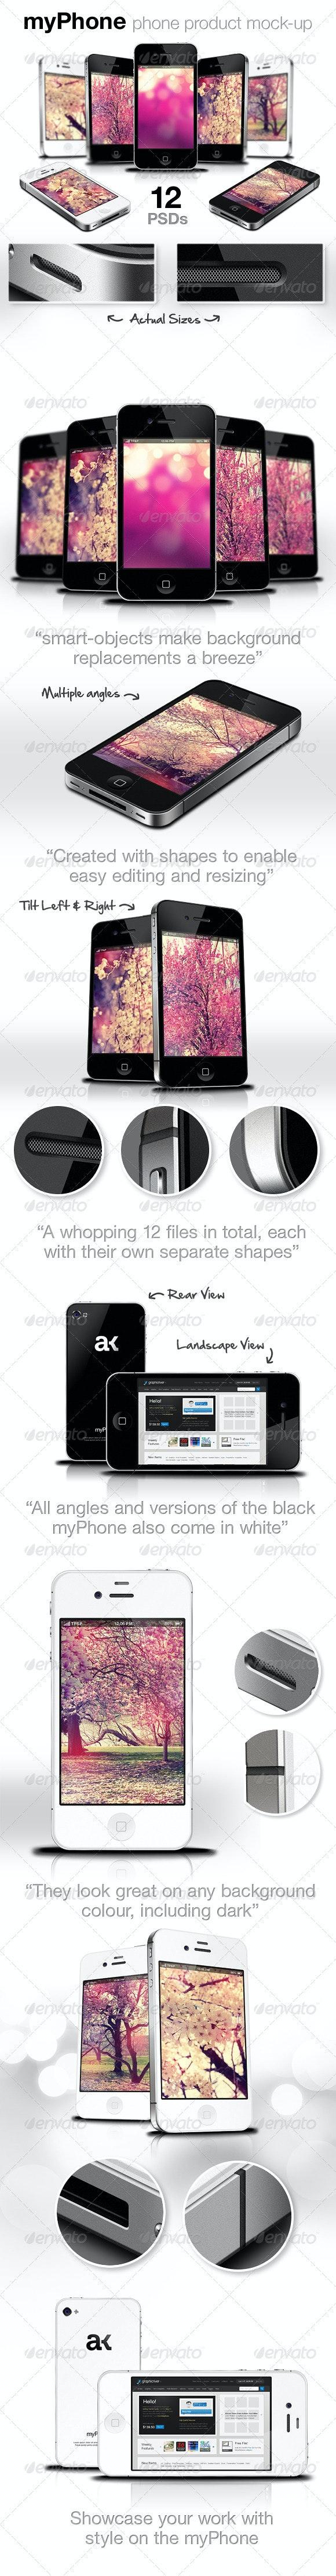 myPhone: Web/App Showcase Phone Mockup - Mobile Displays